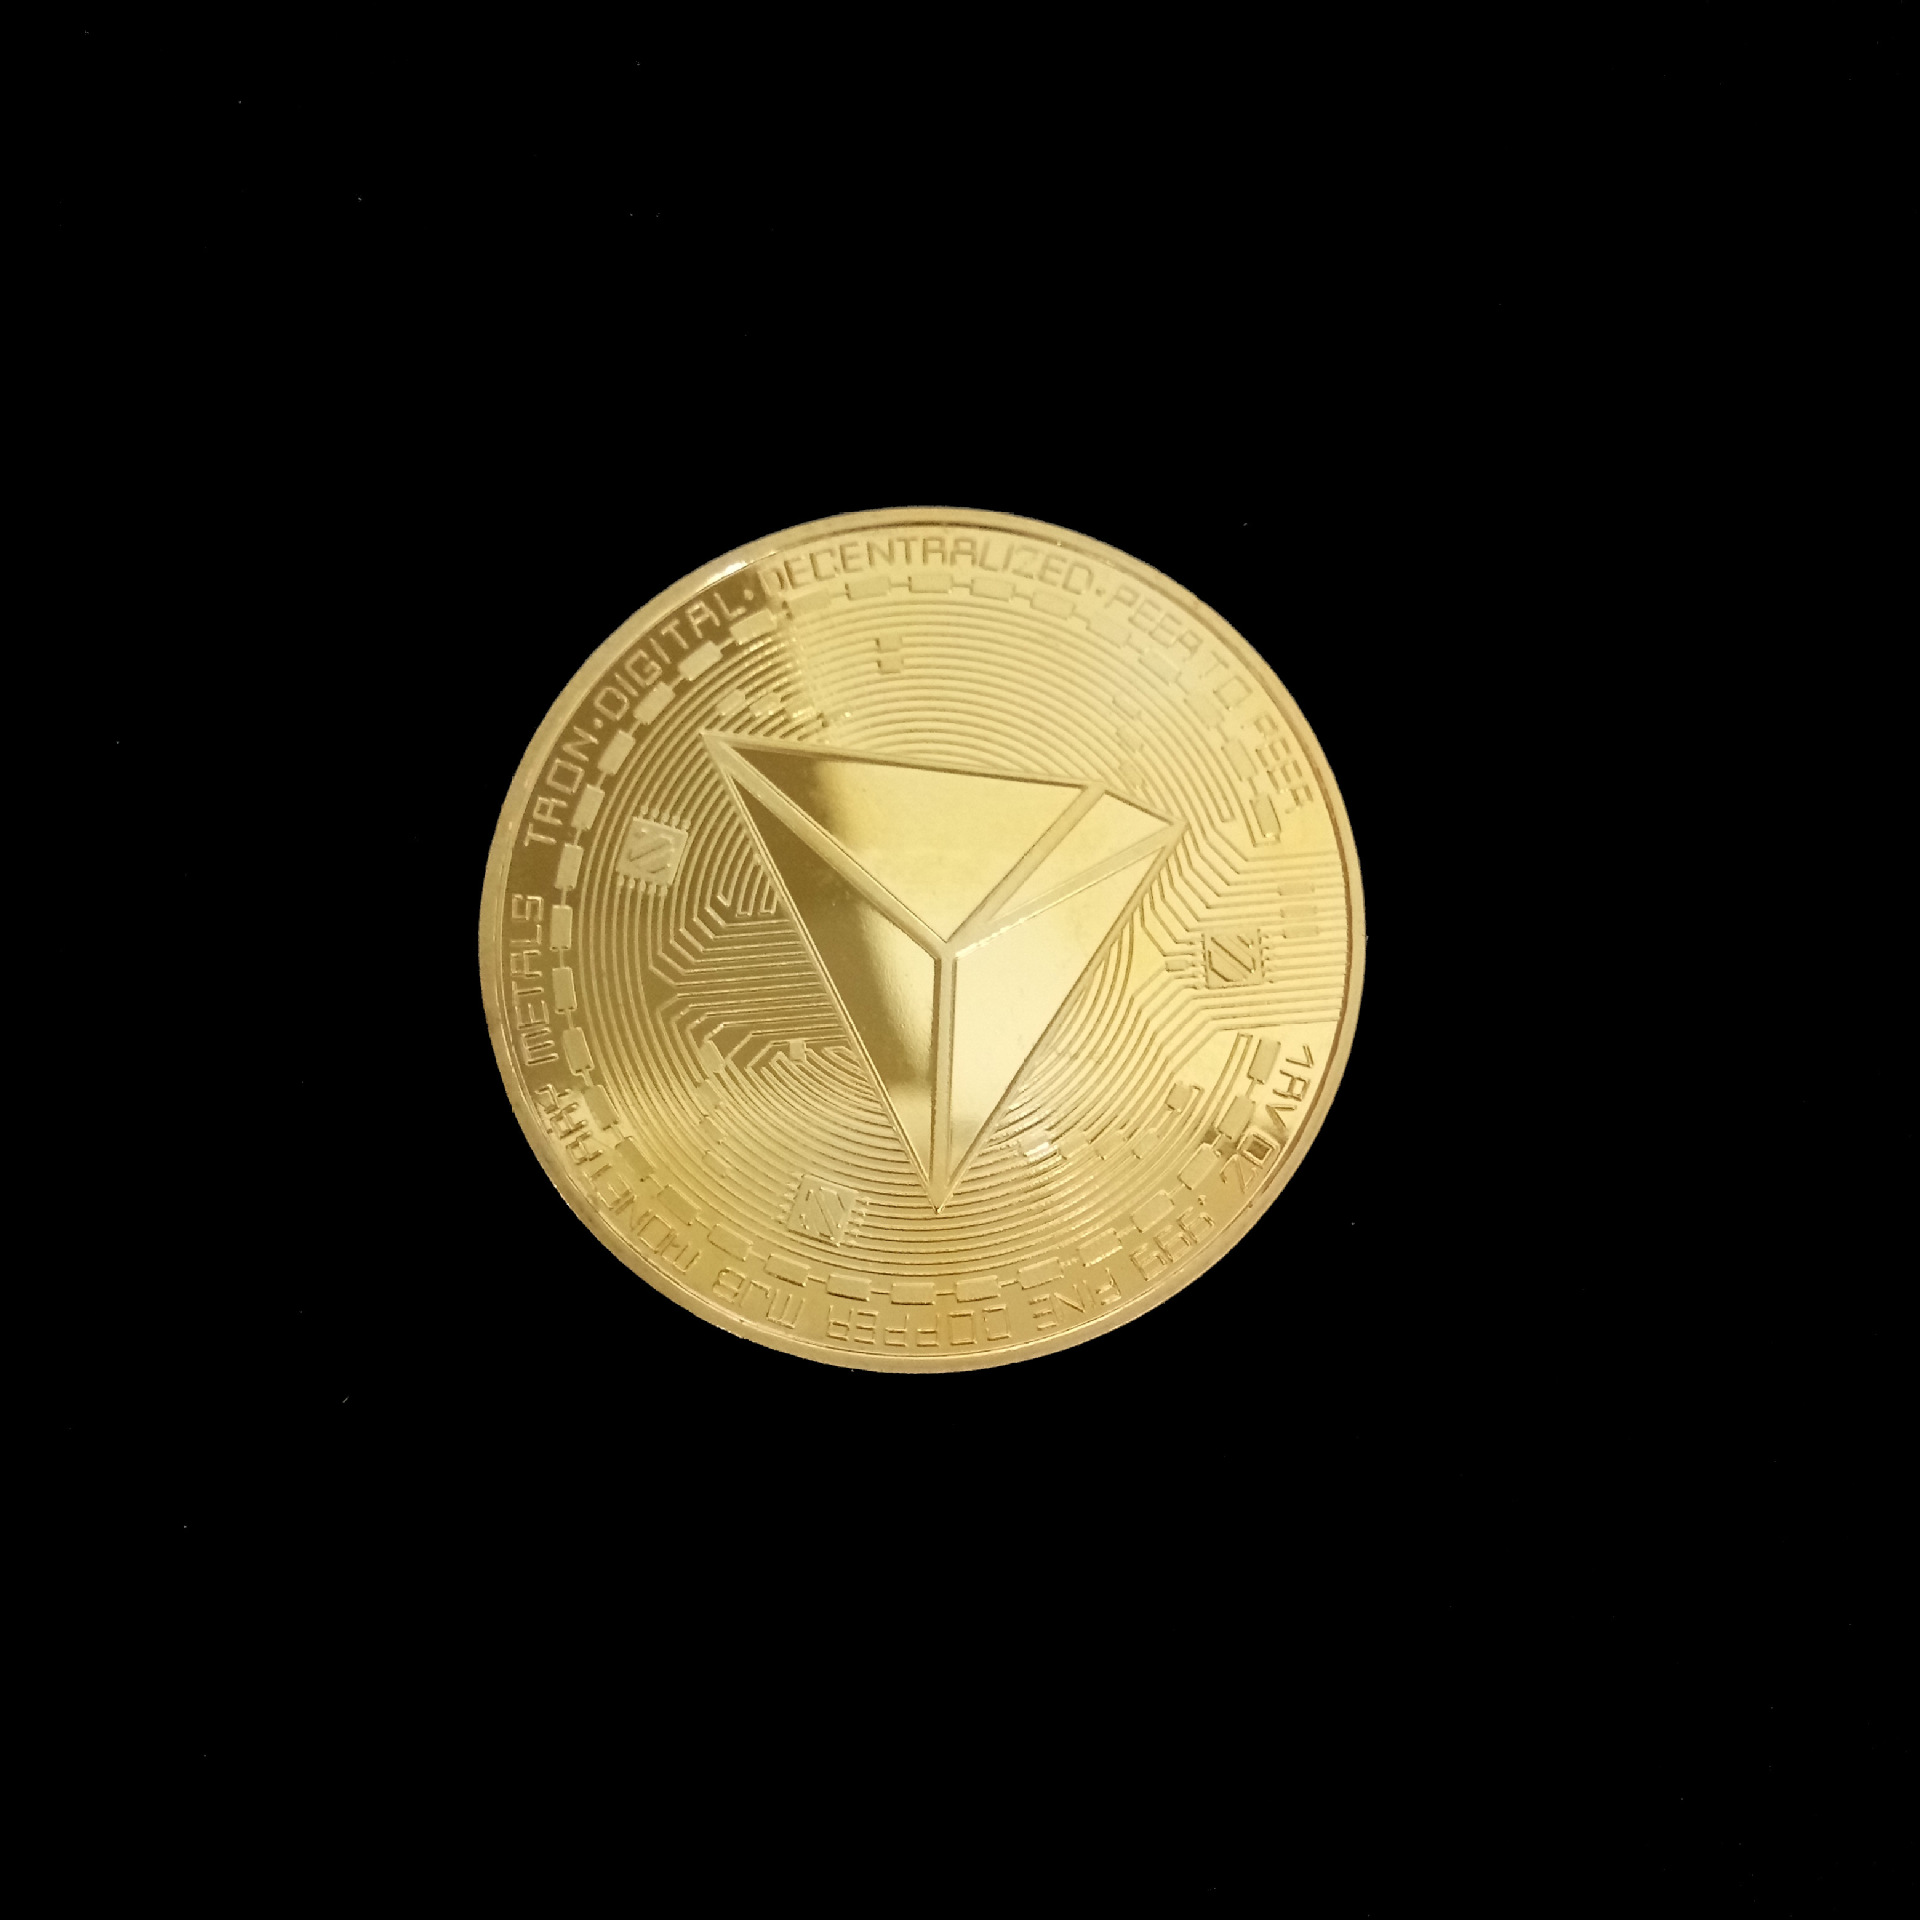 Новые неталютные TRX монеты виртуалные металлические памятные монеты TRX монеты Биткоин памятные монеты подарок Прямая - Цвет: Gold